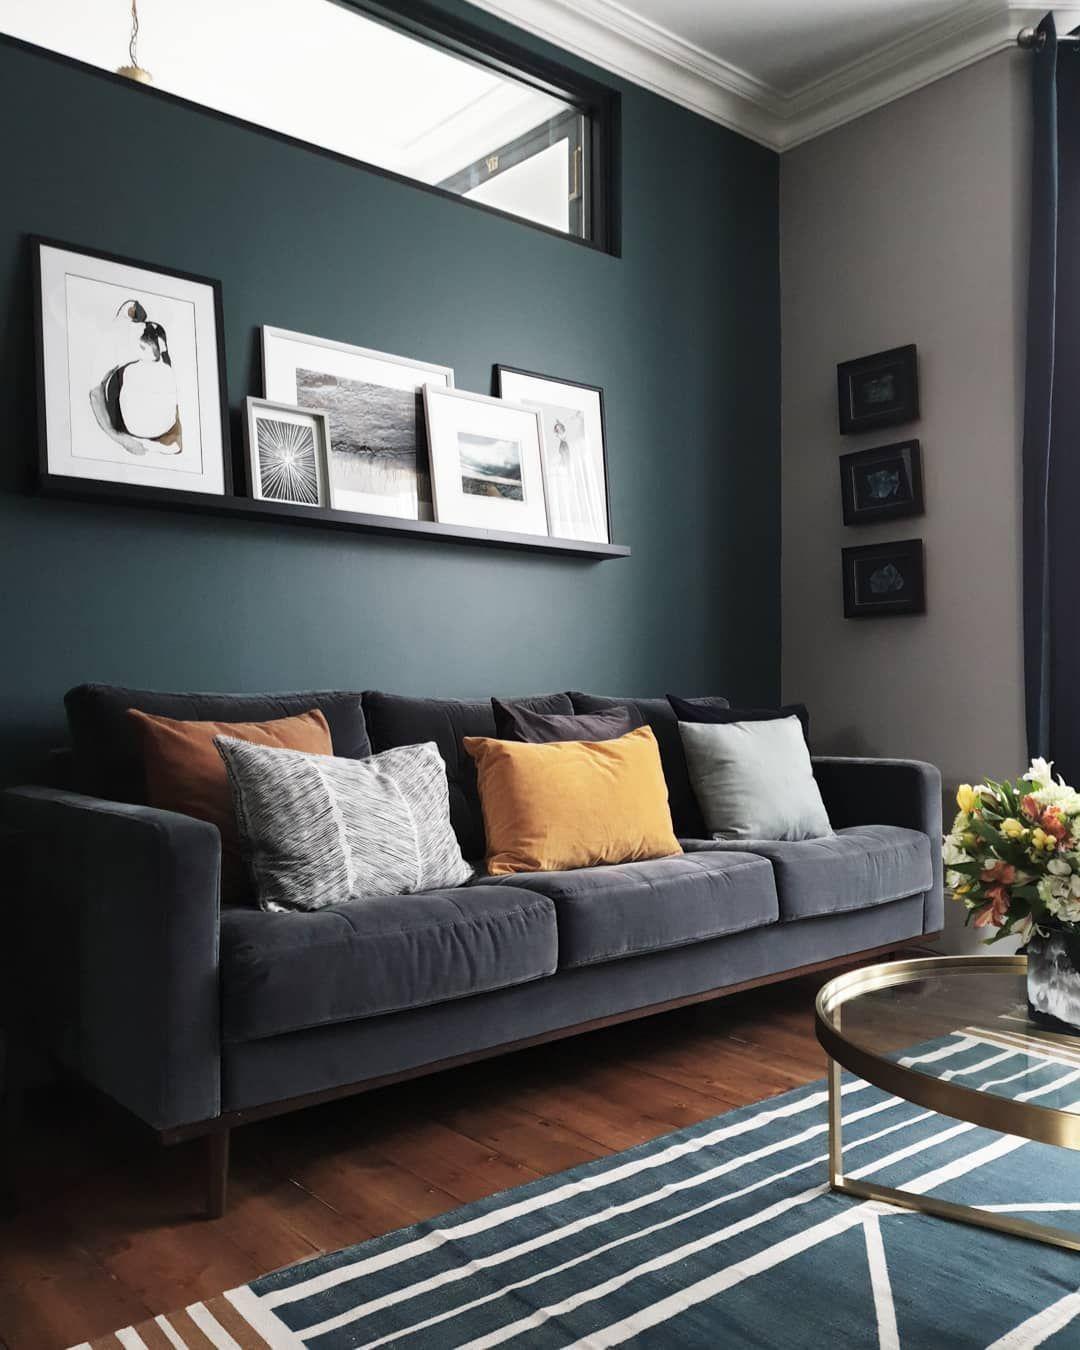 Modern Victorian Living Room With Dark Walls In Farrow Ball